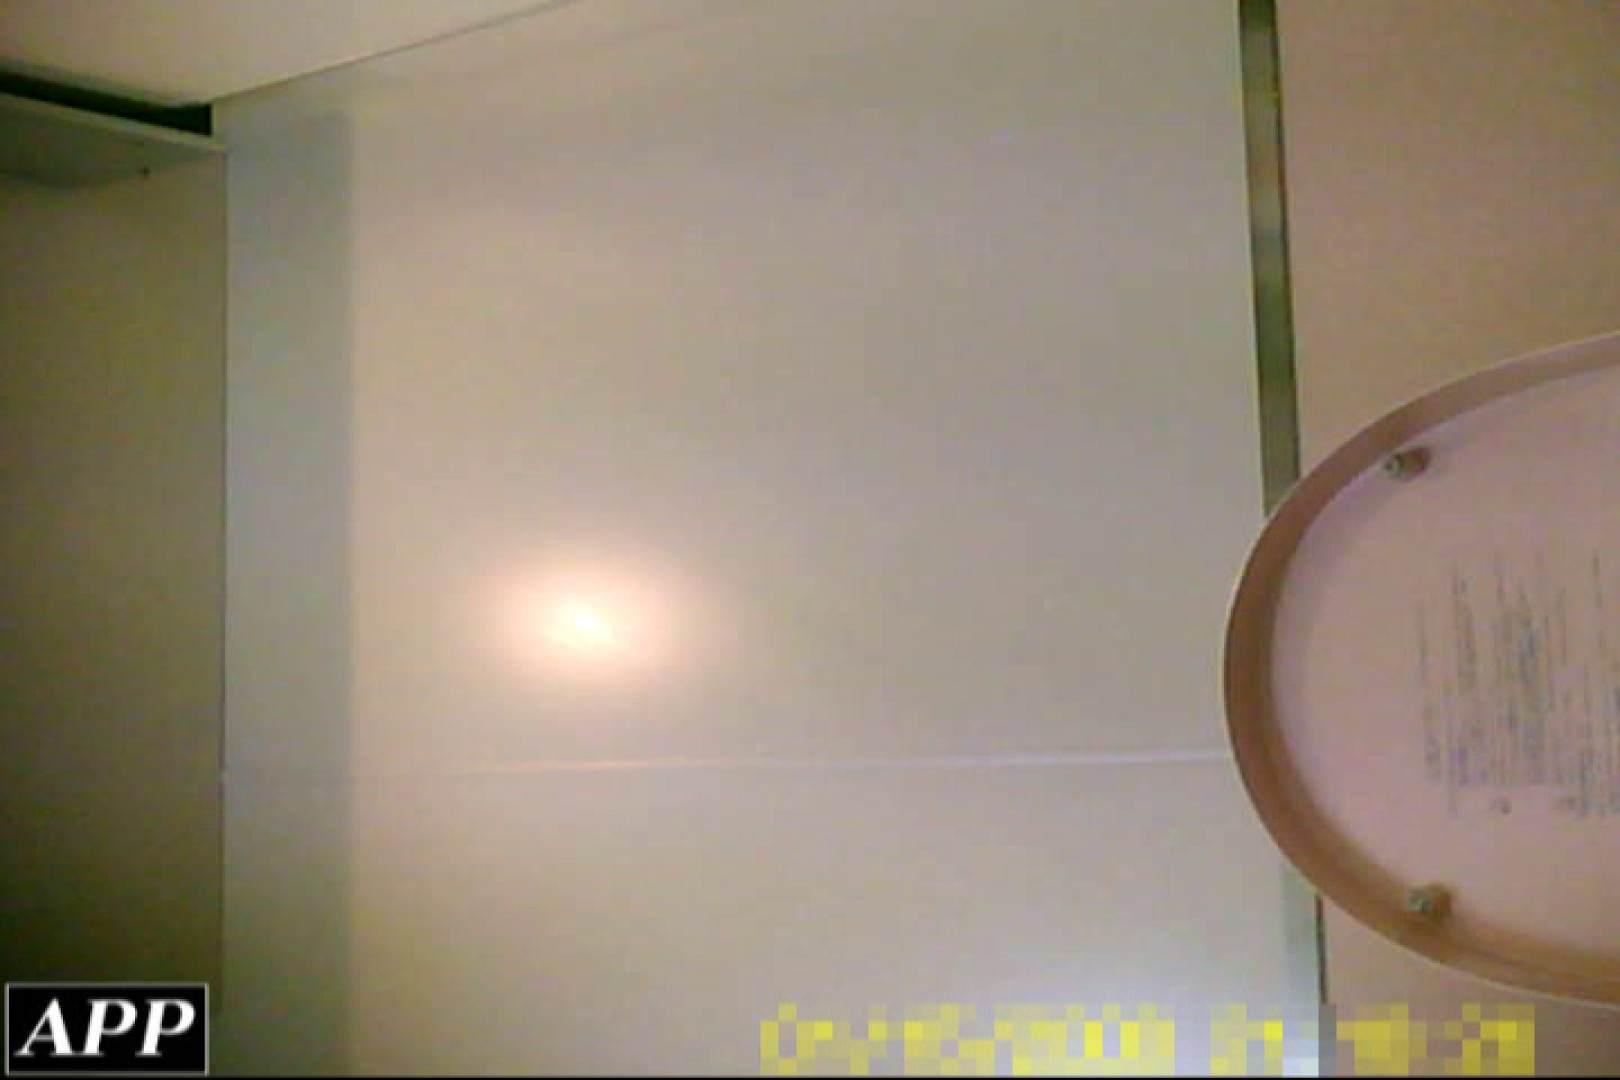 3視点洗面所 vol.076 OLセックス | 洗面所  74画像 23